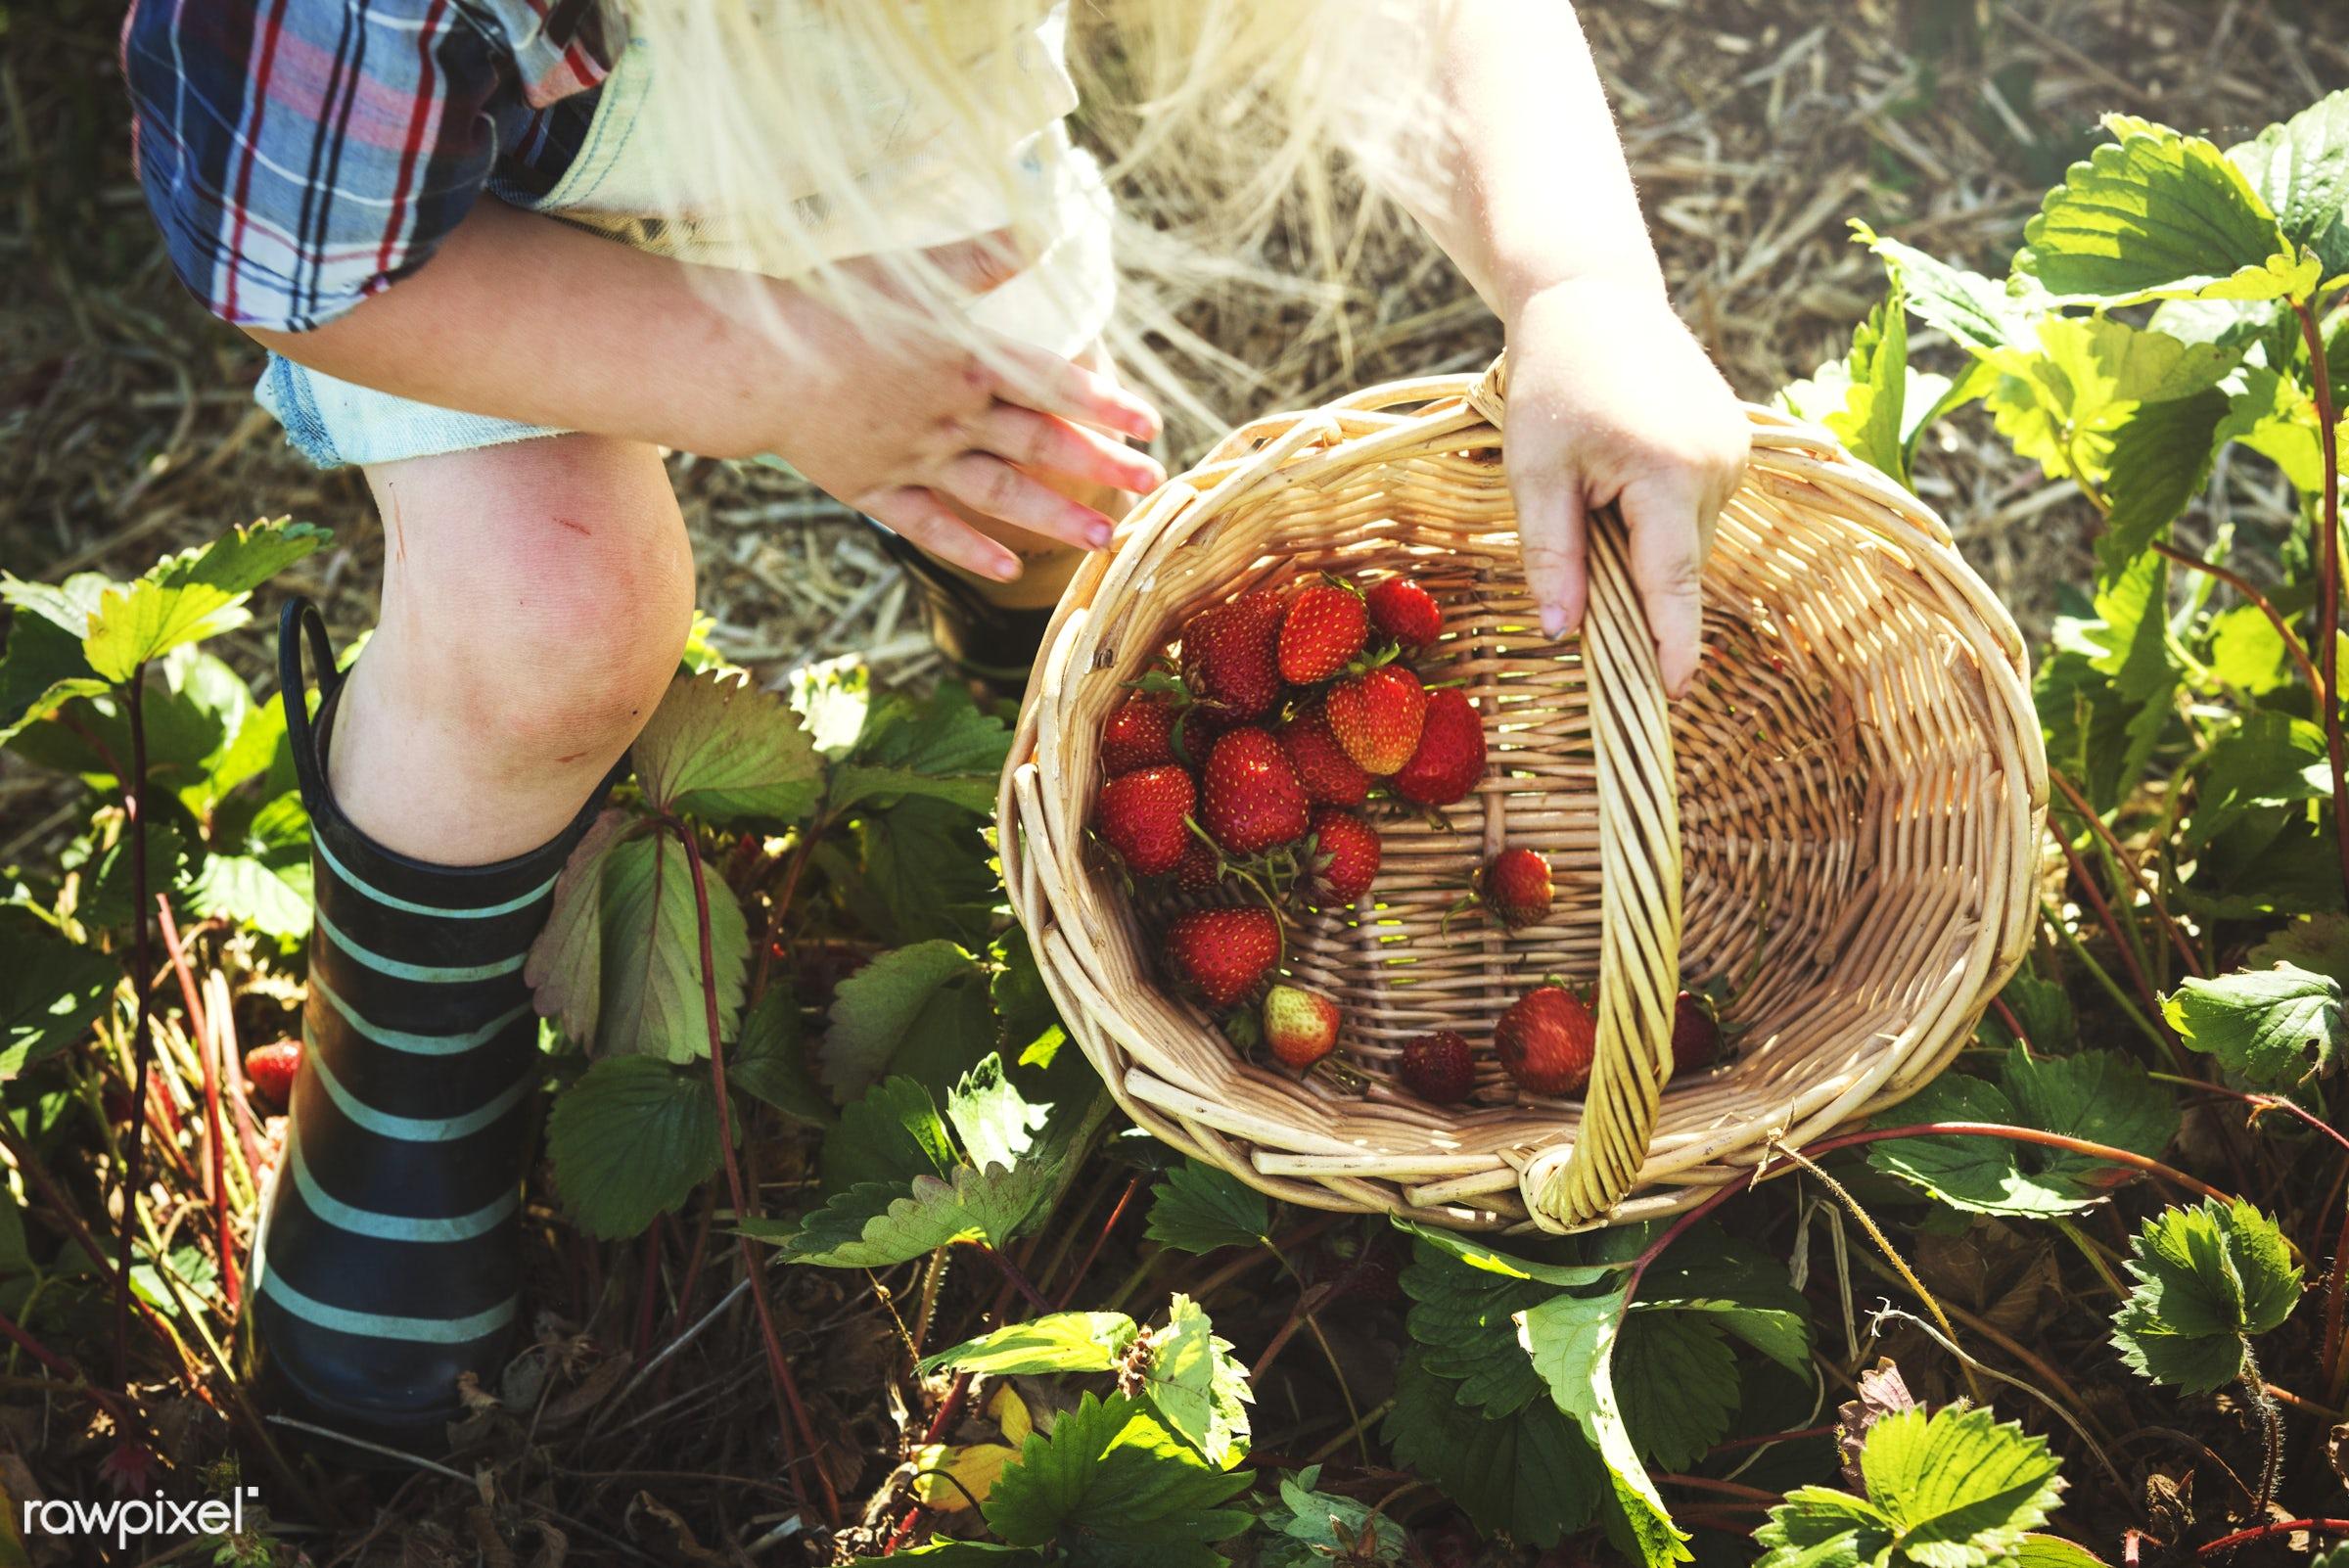 Kid in strawberry farm - alone, backyard, botany, boy, child, children, countryside, cultivate, farm, field, fresh, fruit,...